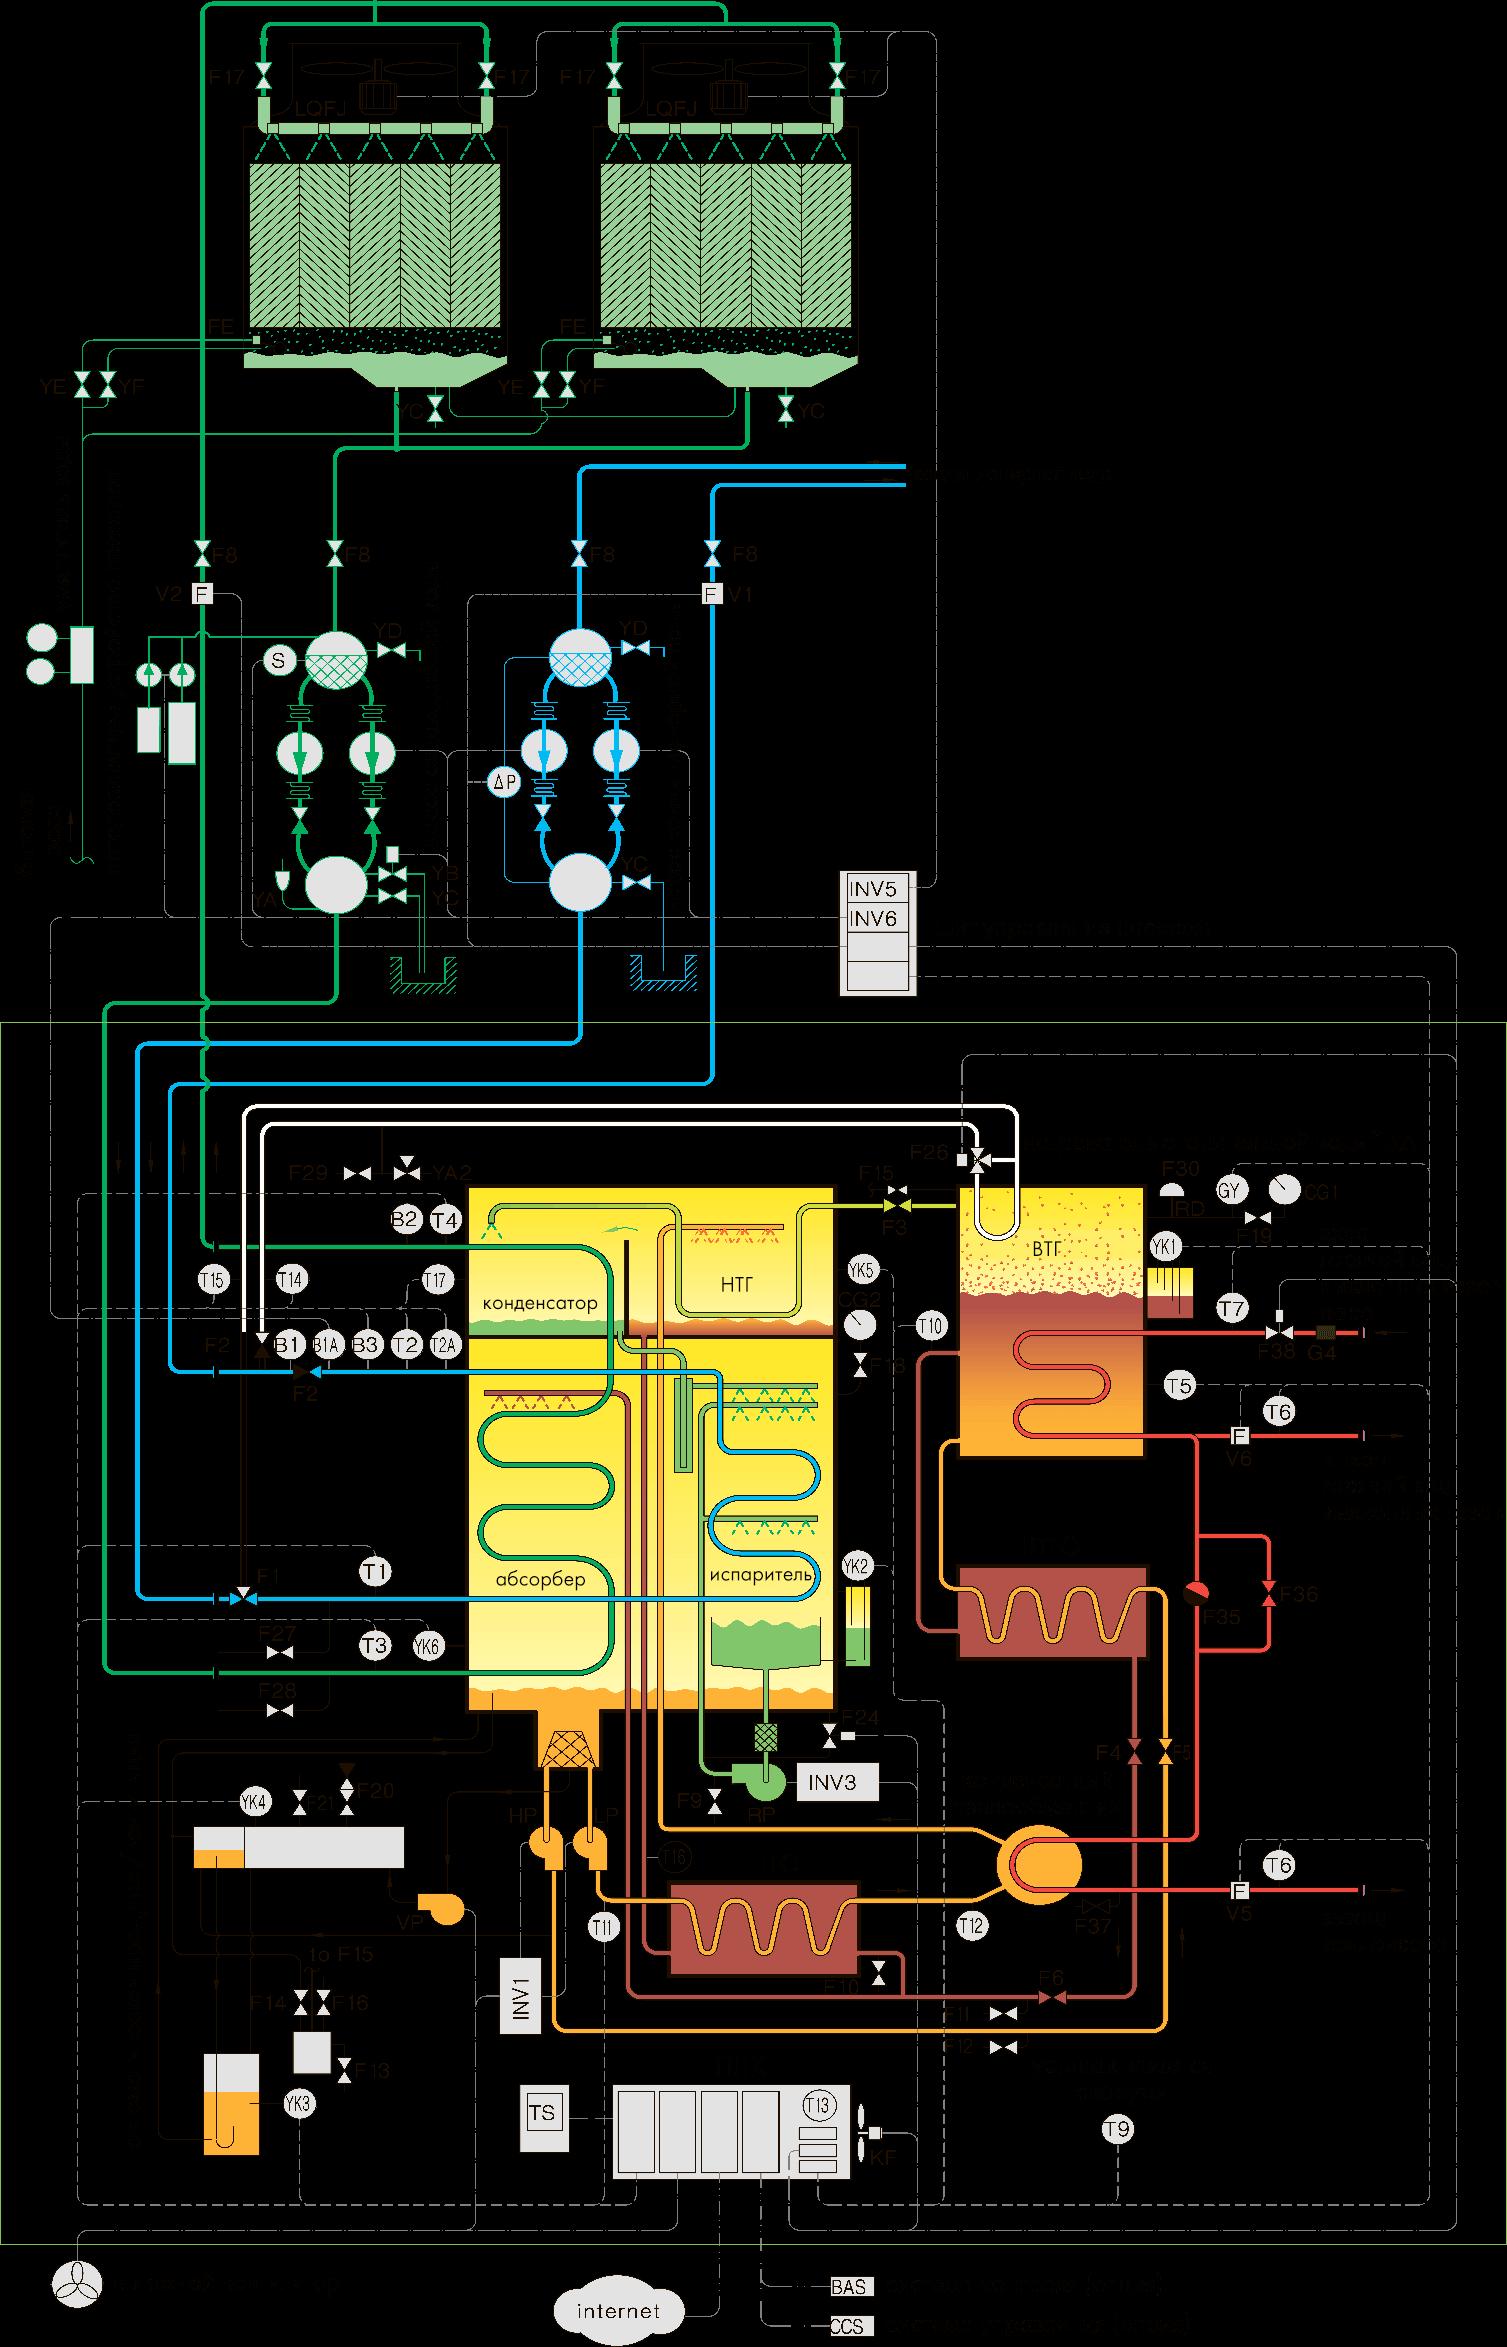 схема абхм broad на паре, схема абхм broad на горячей воде, схема абхм broad на выхлопных газах